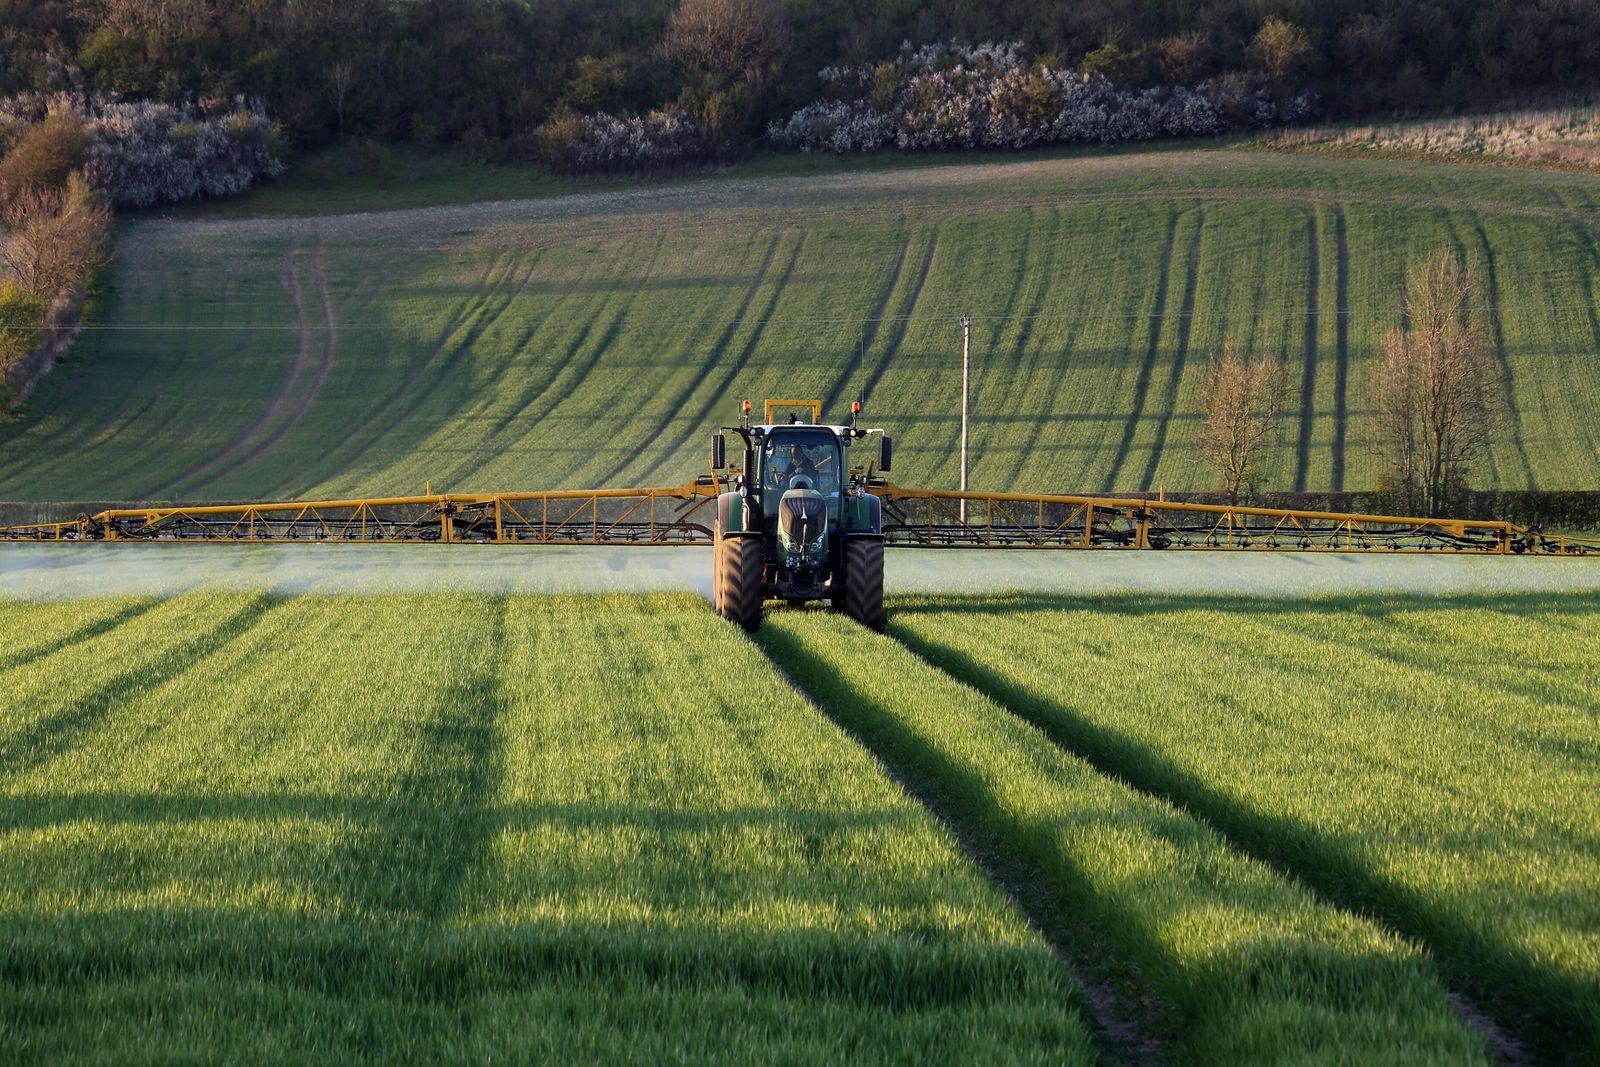 Agriculture - A farmer spraying fertilizer on his crops - North Yorkshire - England. (SteveAllen)